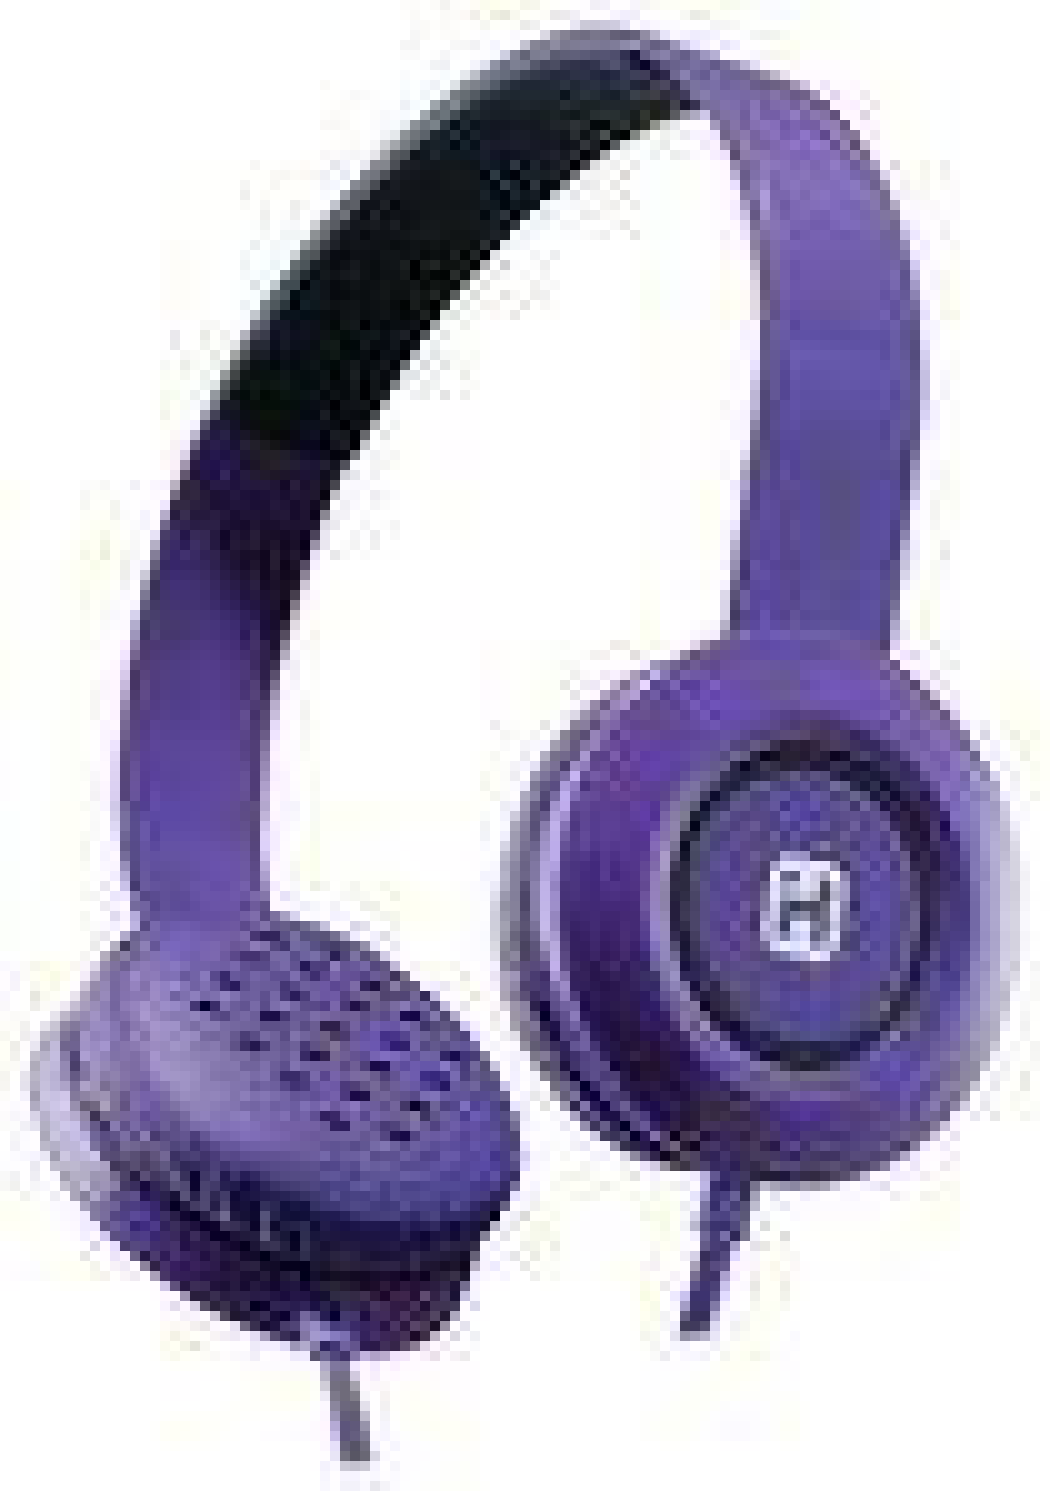 Ihome - Stereo Headphones - Purple